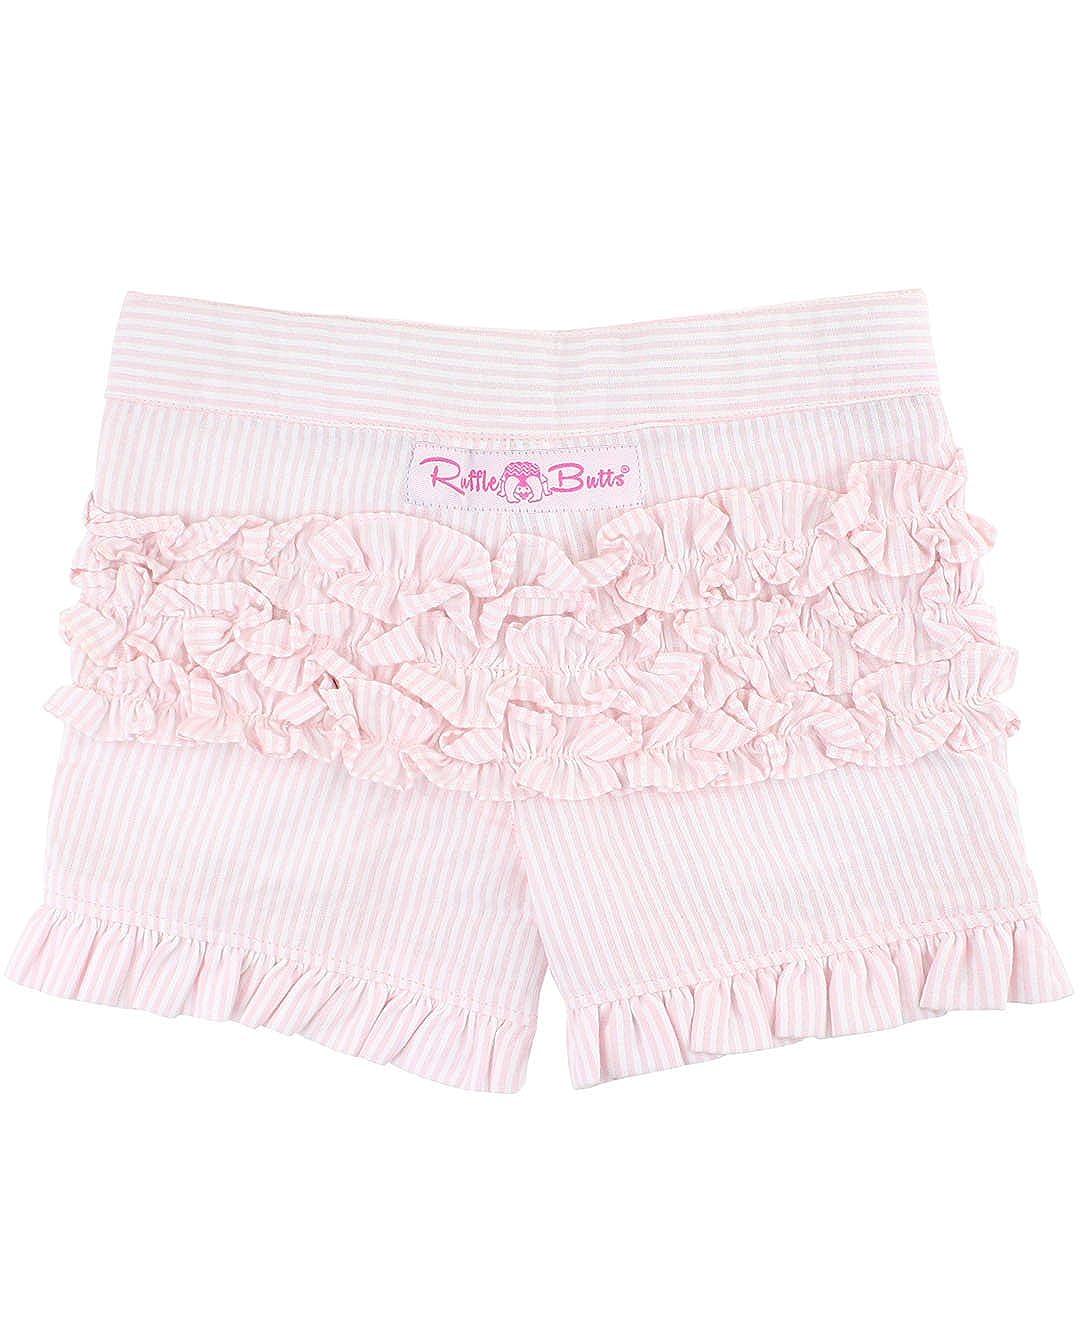 RuffleButts Baby//Toddler Girls Woven Shorts w//Ruffle Hem